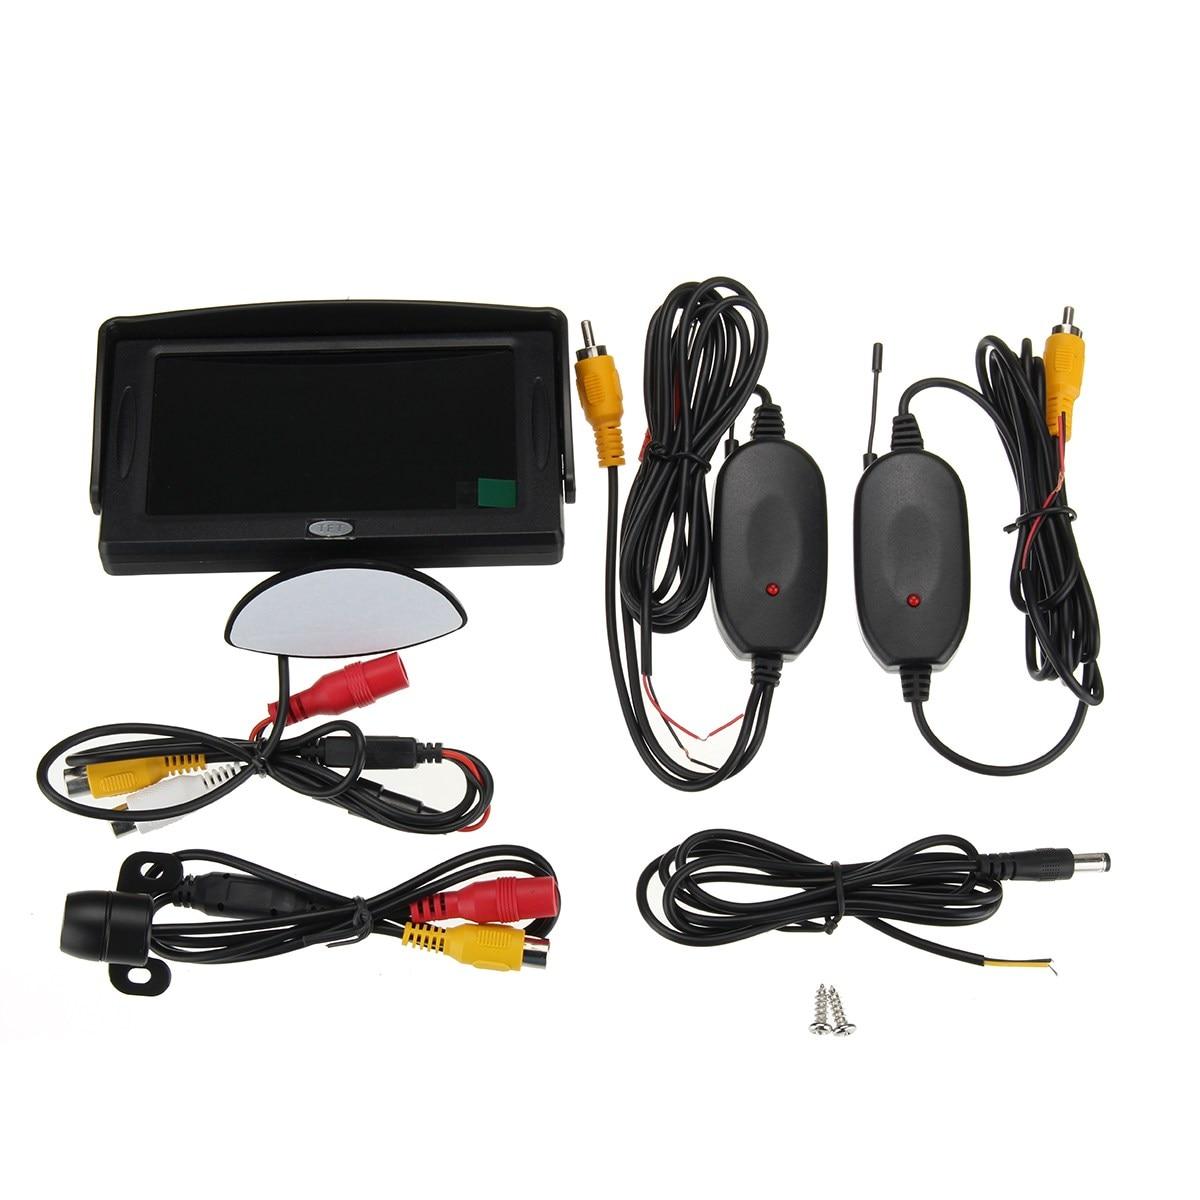 Wireless 120 Degree Car Rear View Backup Reverse Camera 4.3TFT LCD Screen Monitor